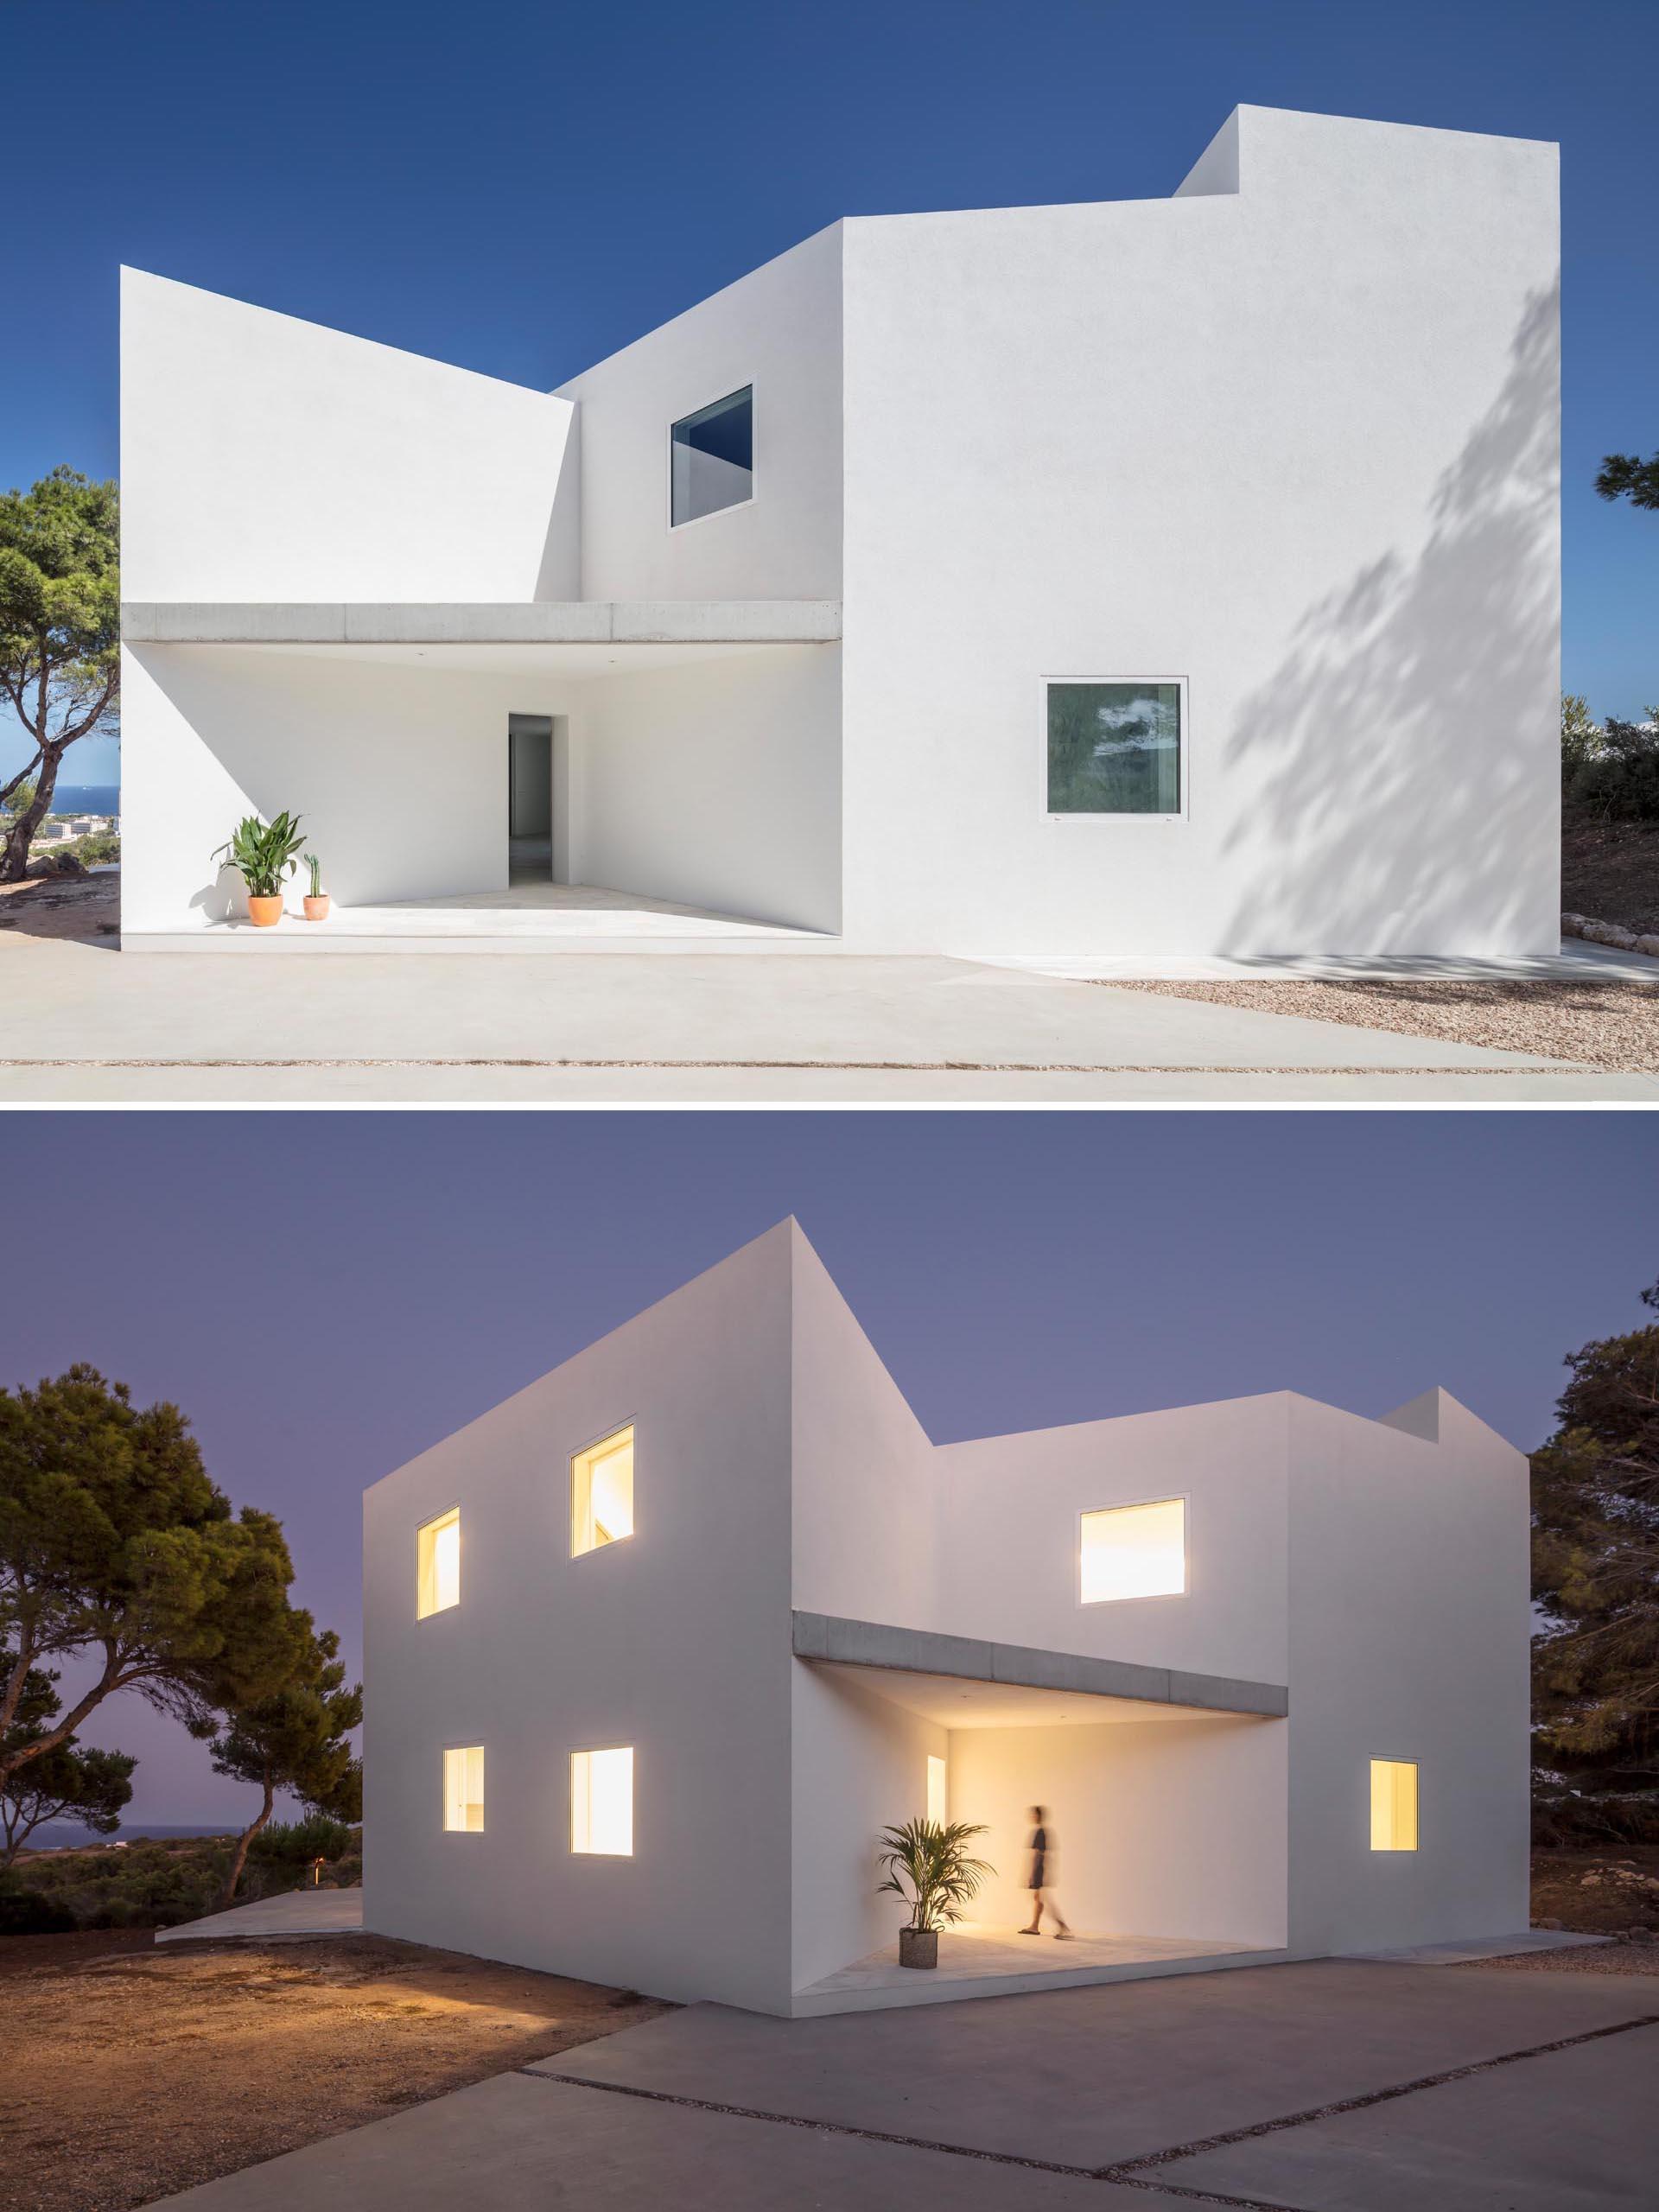 A modern white home with an angular design.